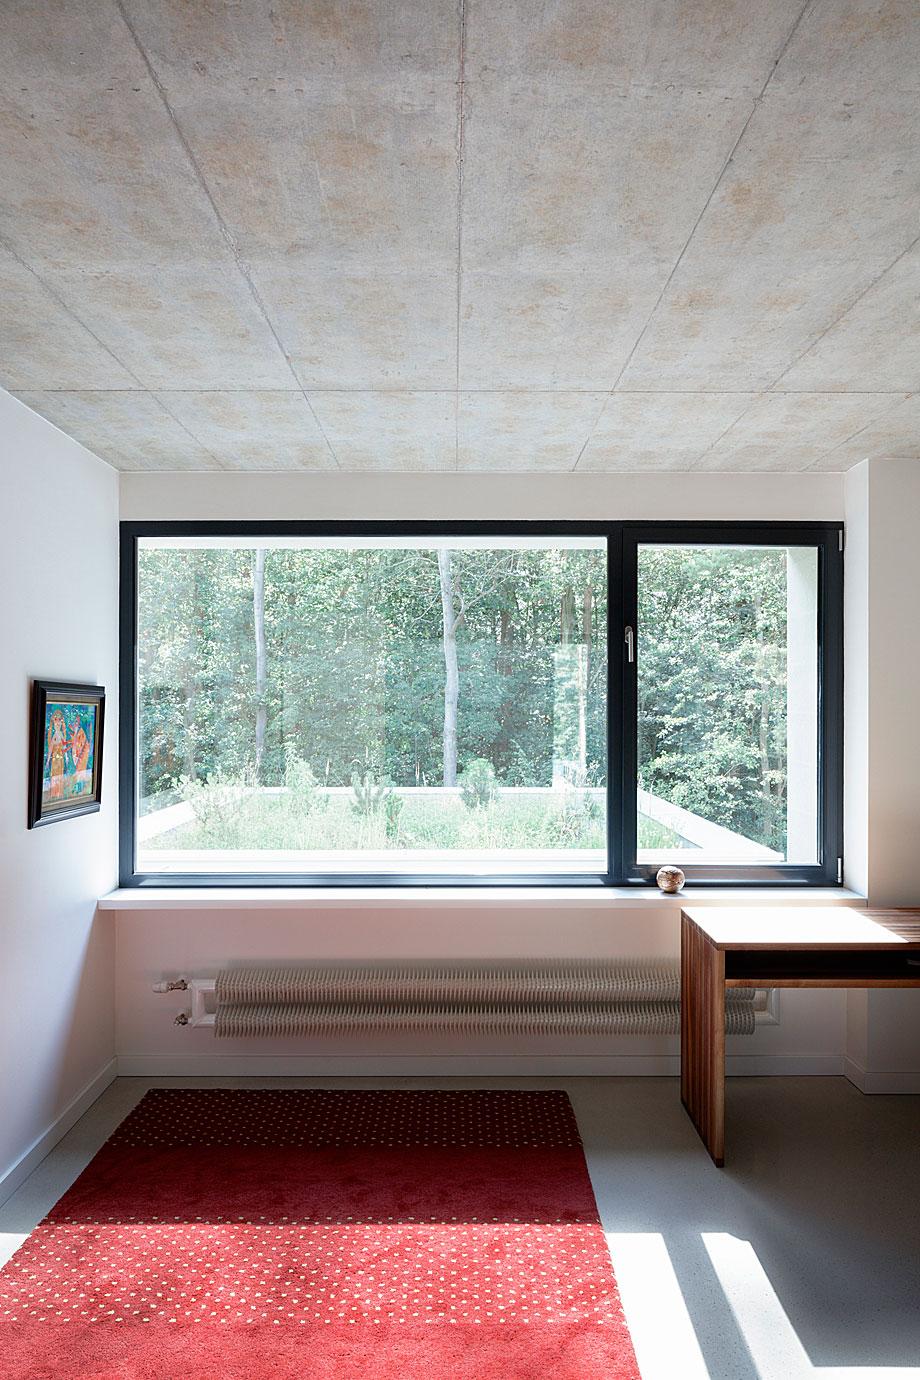 casa-unifamiliar-klanovice-adr-architects-11